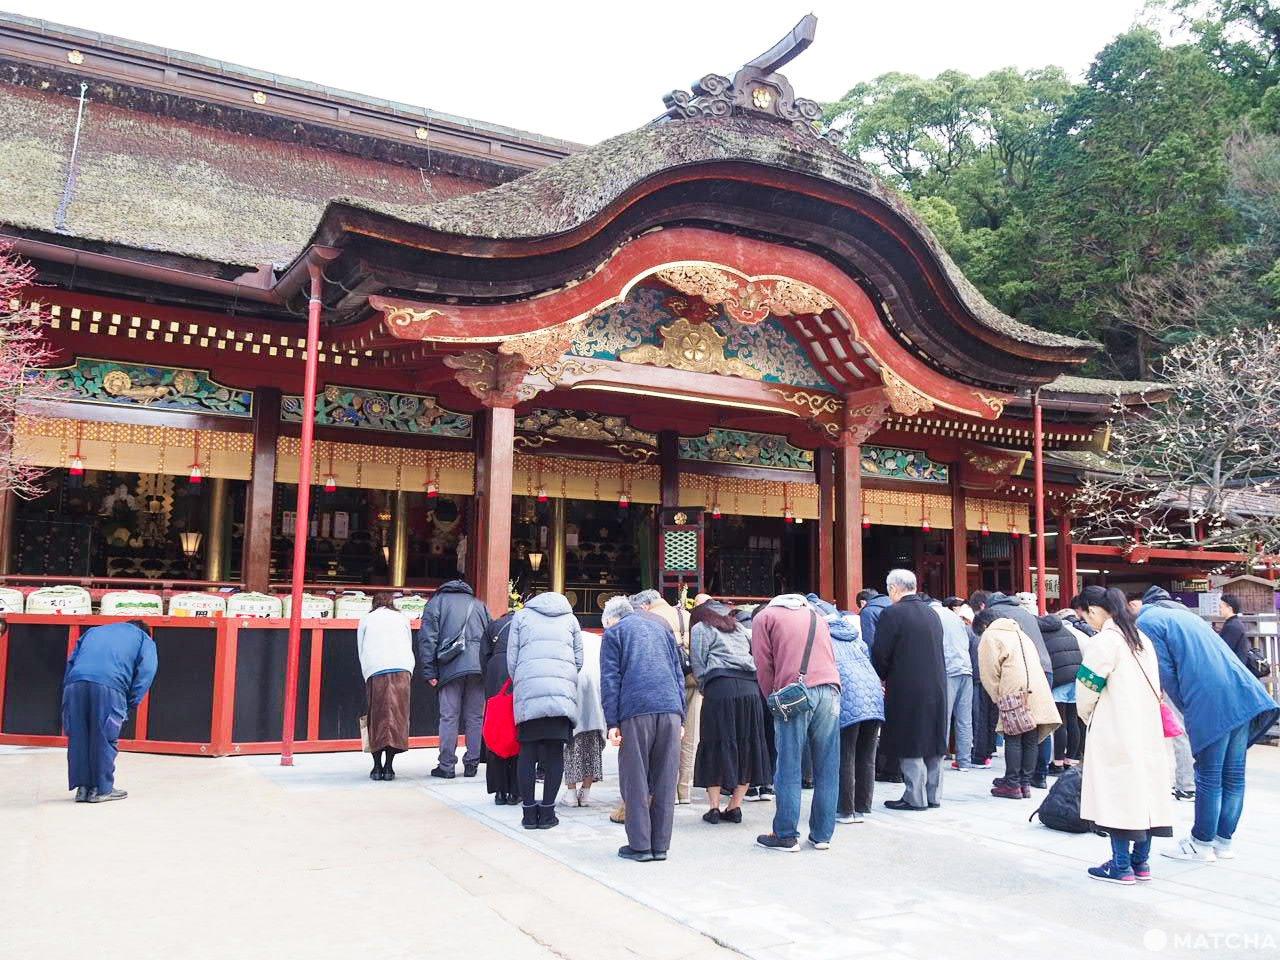 Paying Homage to Dazaifu